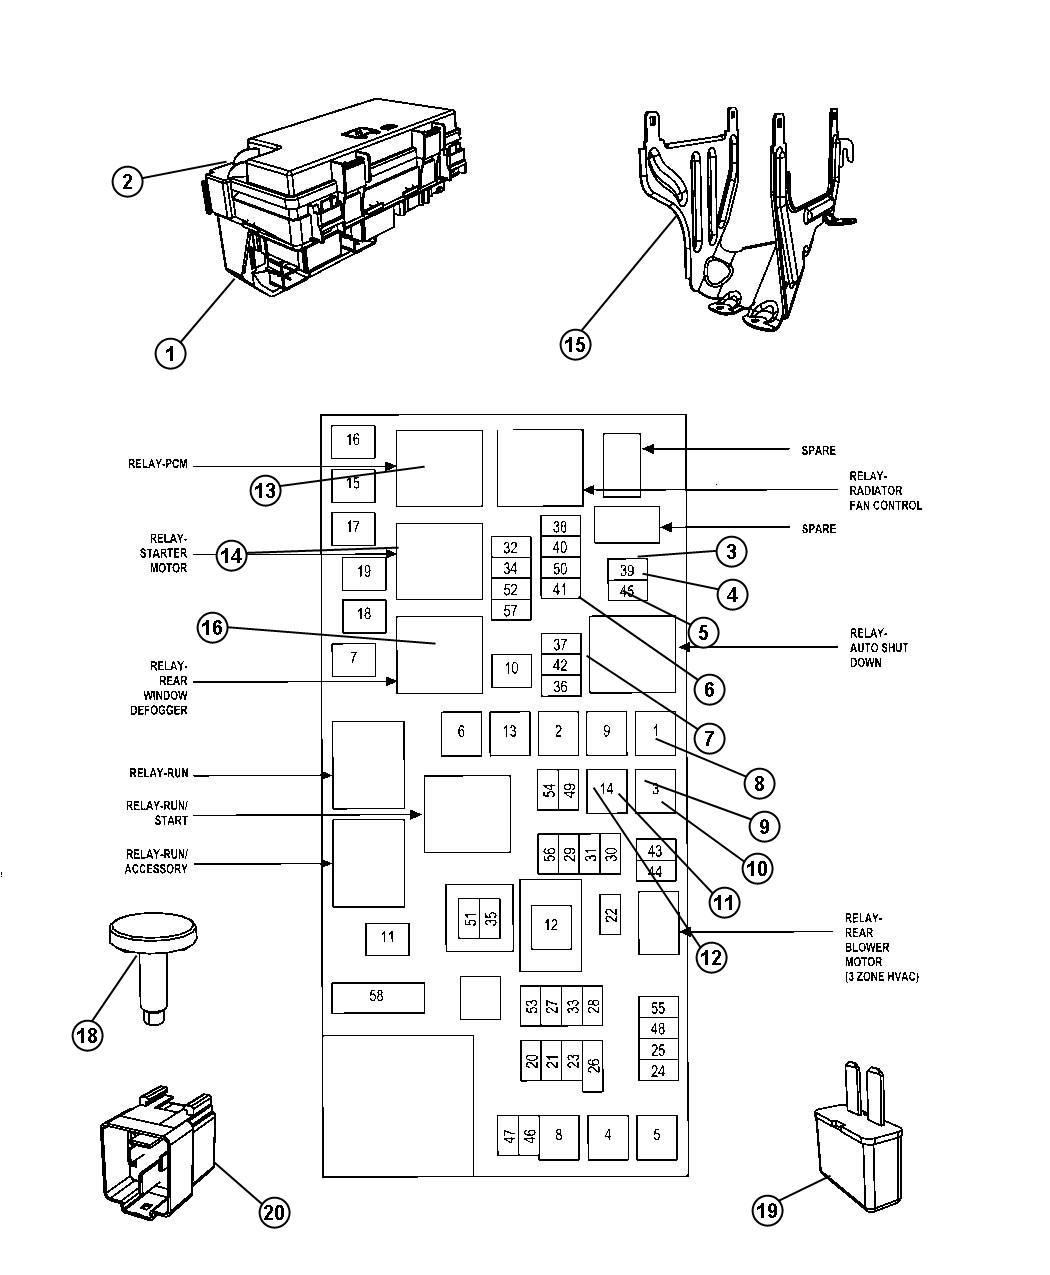 i2217575  Dodge Nitro Wiring Harness Diagram on subaru legacy, ddx6902s, nissan 240sx, 04 murano engine, kenwood ddx470, ls3 crate engine, vm9212n, mk4 vw 12 pin, for ata 110 jinyun, s13 sr20det engine,